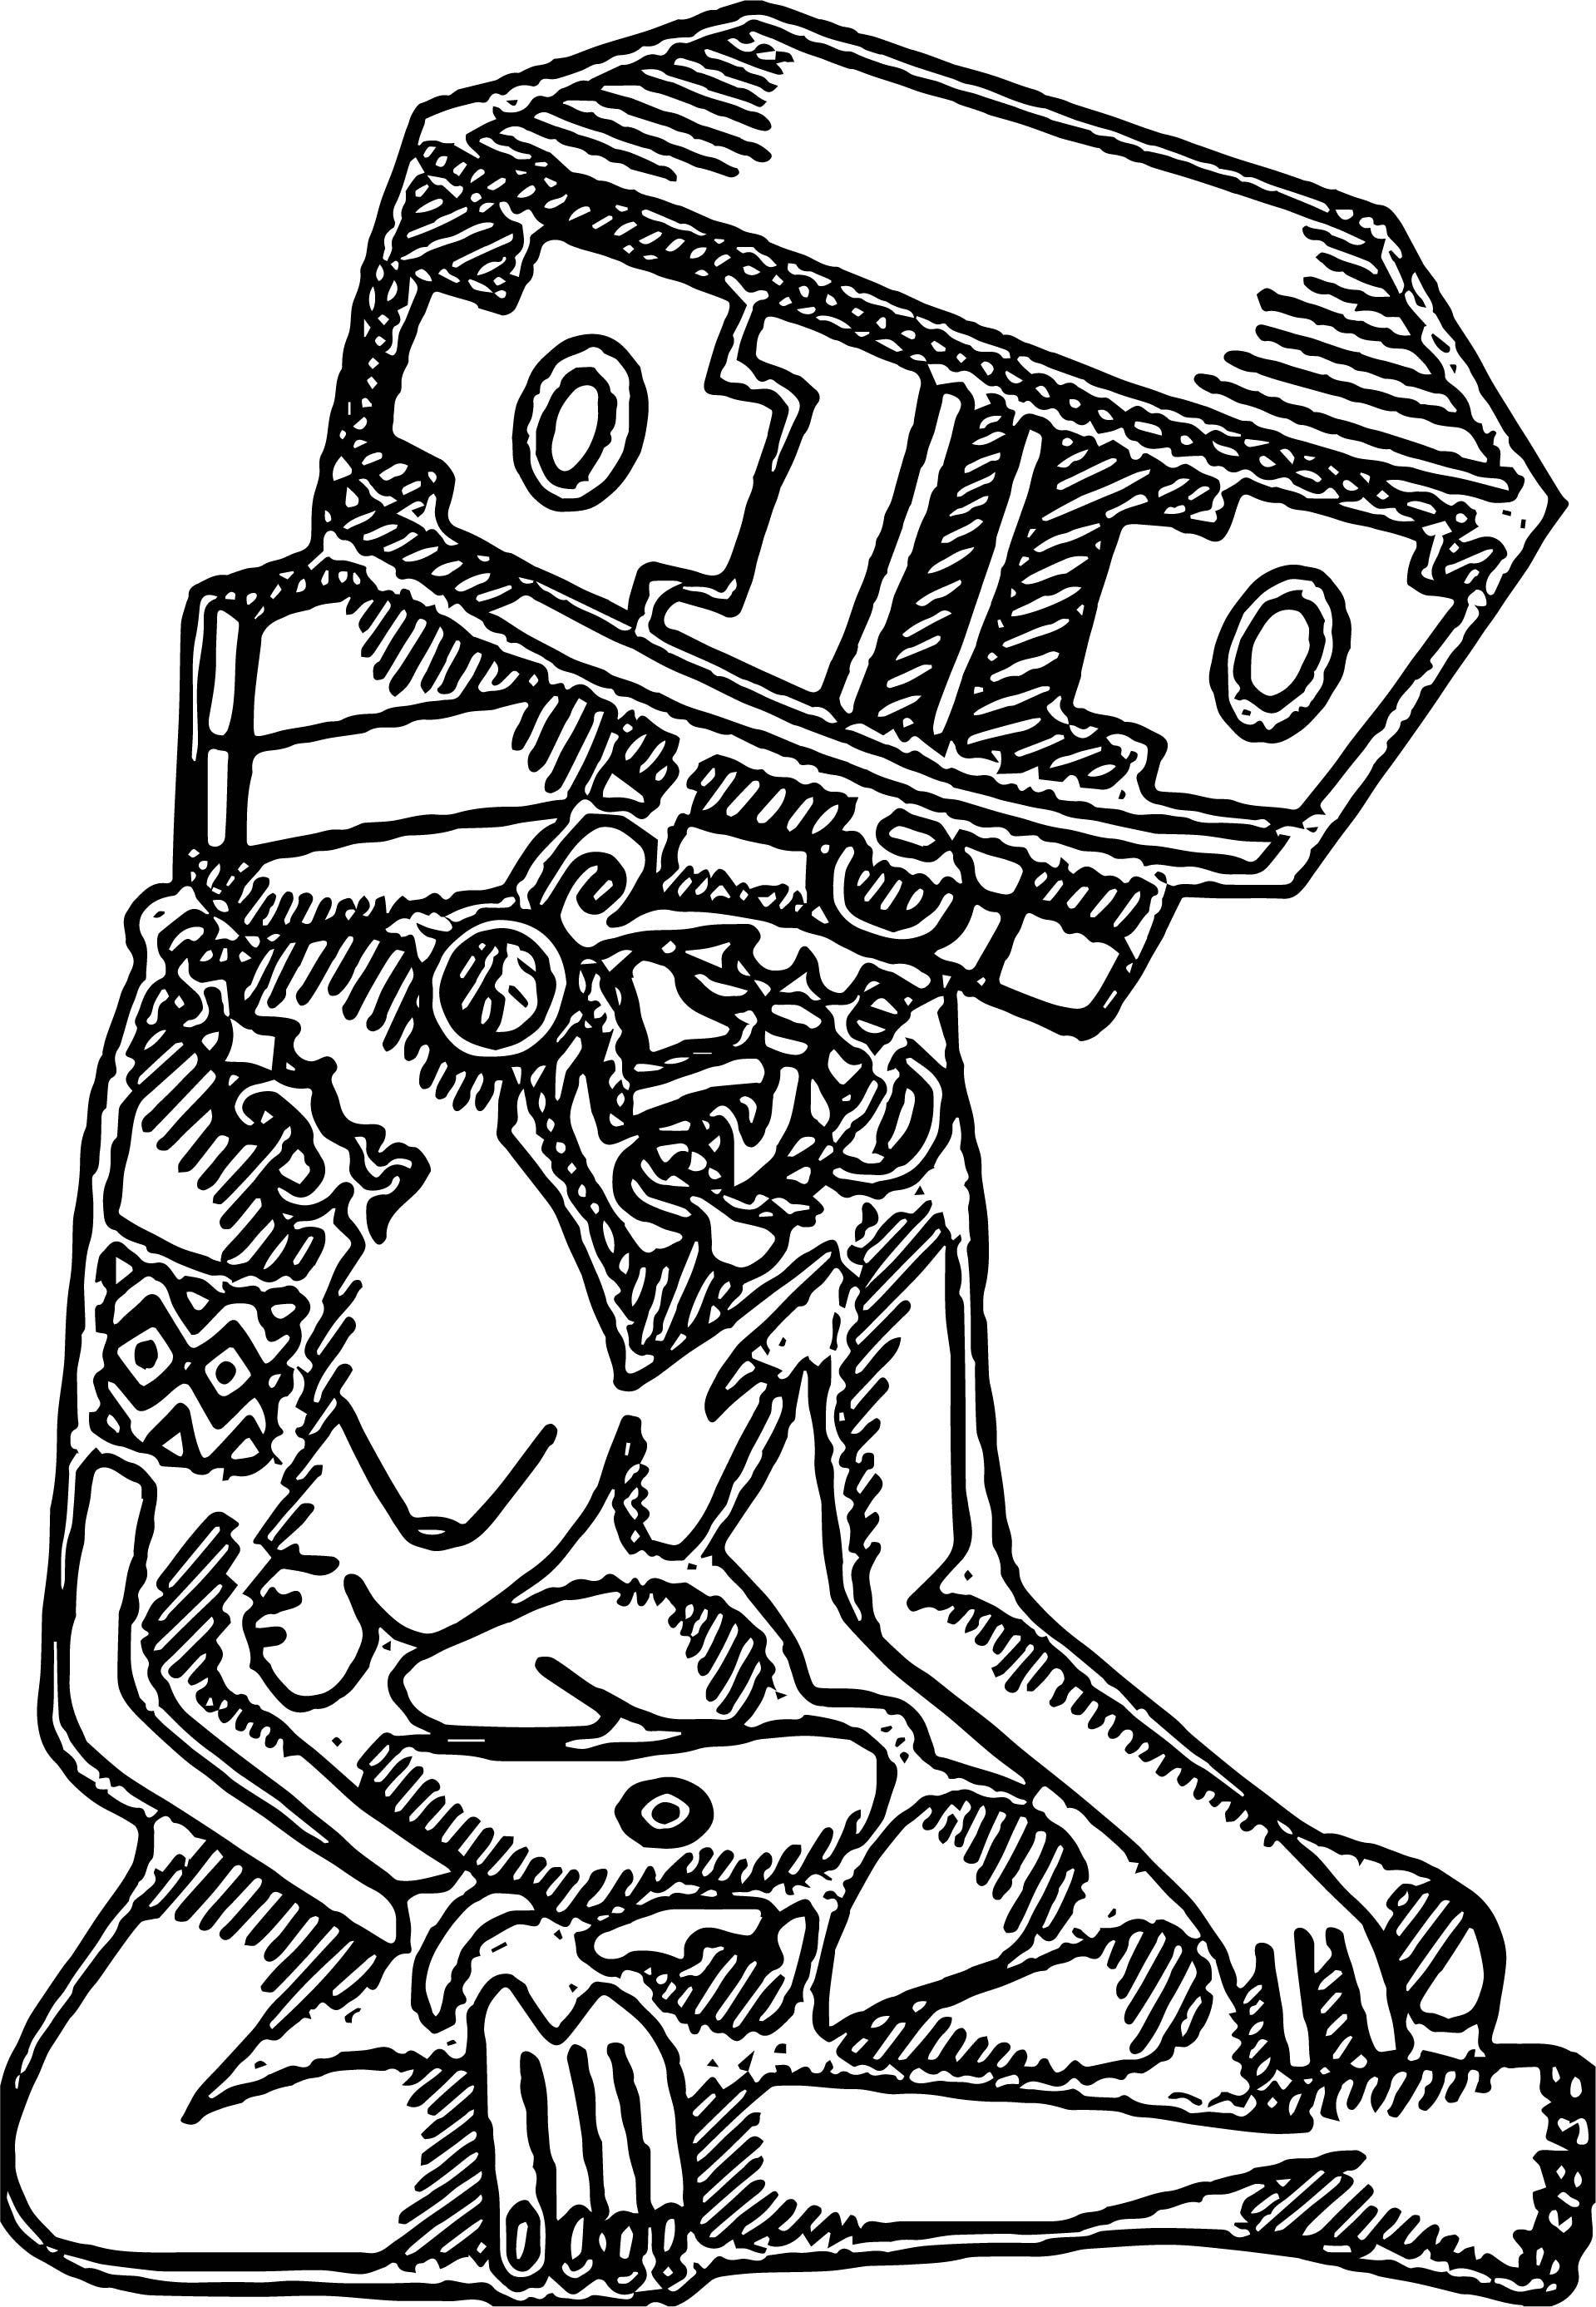 Aztec Huehueteotl Coloring Page   Aztec